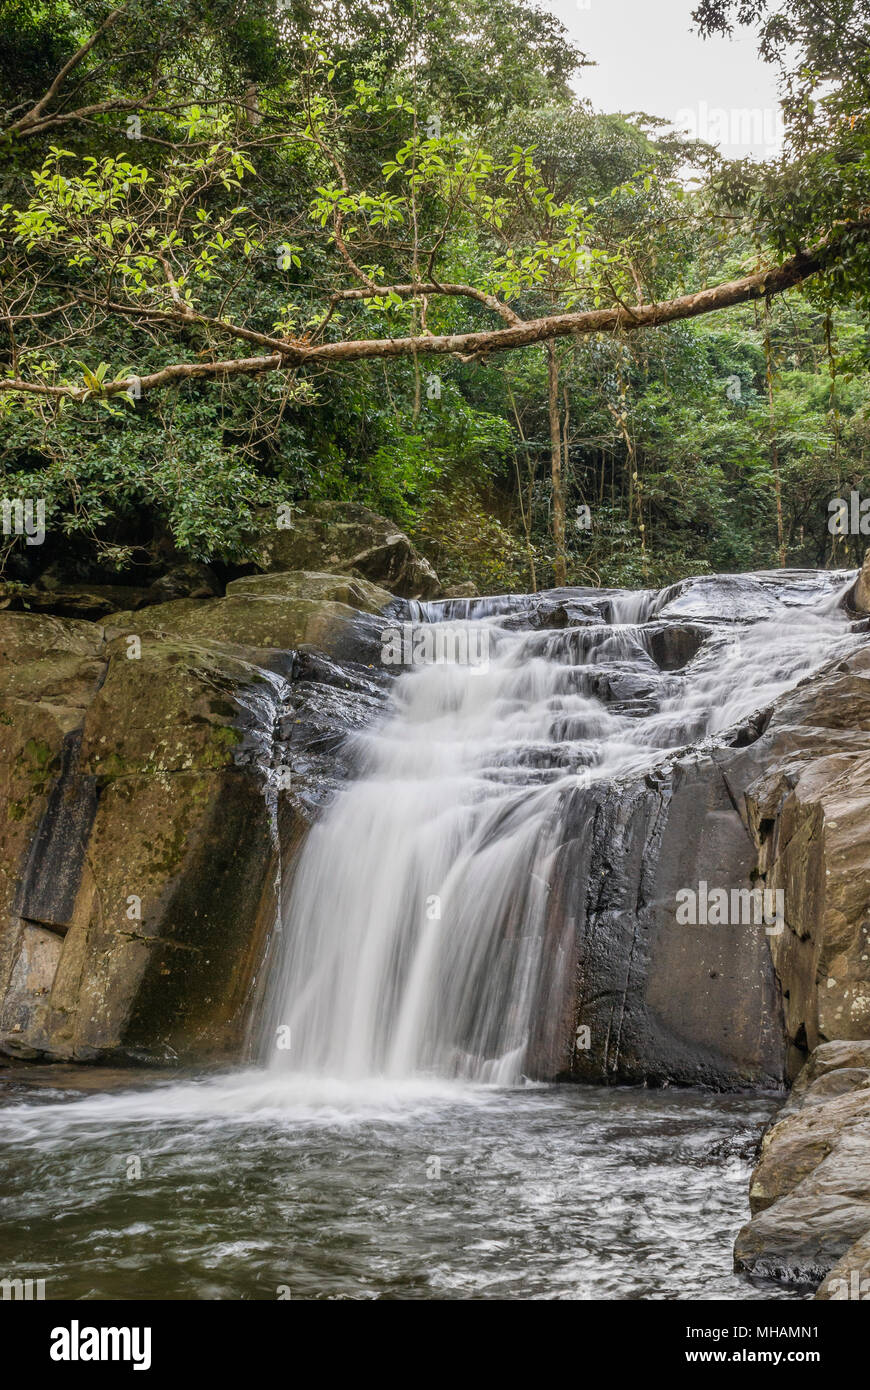 Pala-U Waterfall, Kaeng Krachan National Park, Thailand   Pala-U Wasserfall, Kaeng Krachan Nationalpark, Thailand - Stock Image